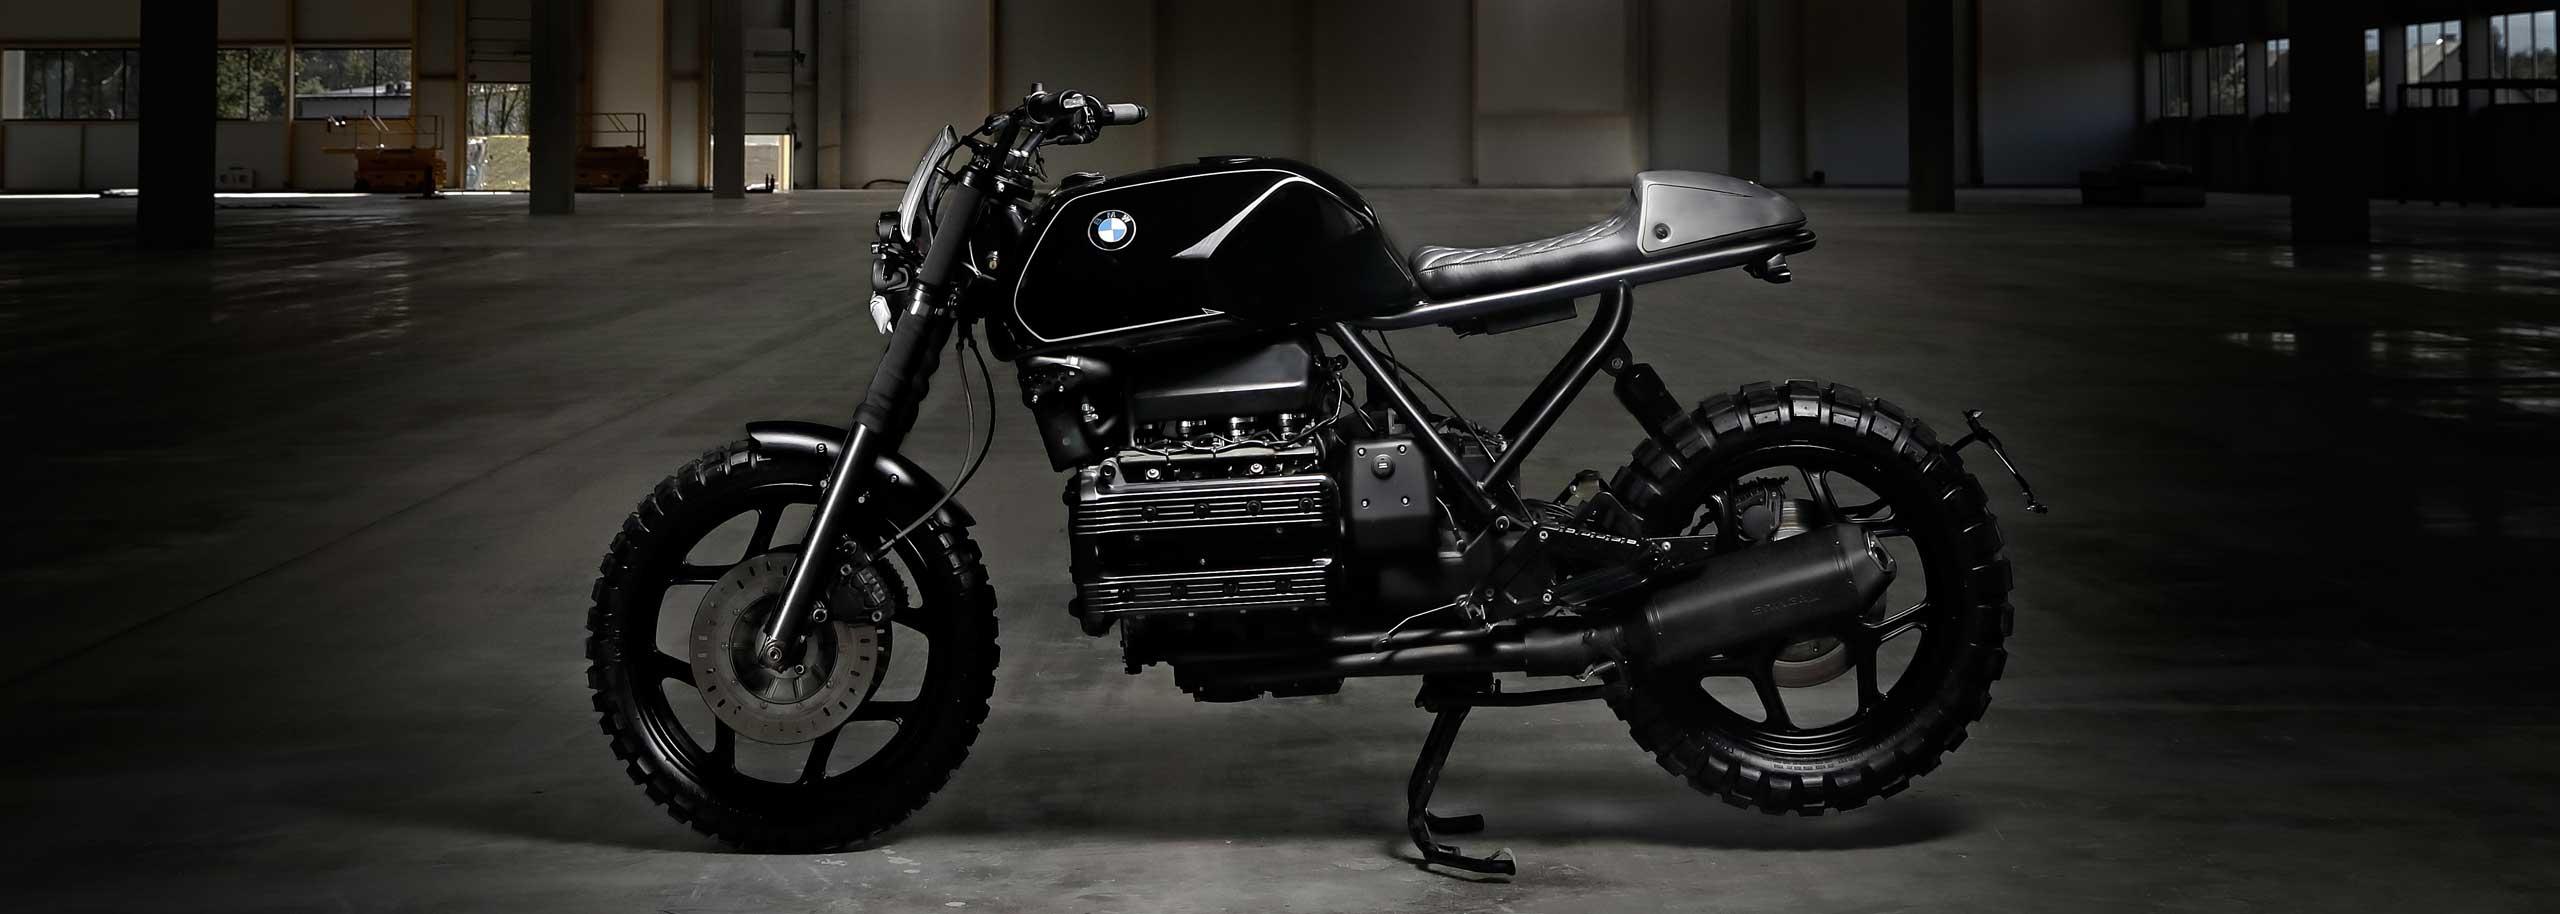 03_TITAN-Xaver_BMW-K100-Umbau_Cafe-Racer-Graz-Motorrad-Umbau-Austria-Vintage_Custom-Bikes_Zweirad_Customteile-Kundenwunsch-Rizoma-Motogadget